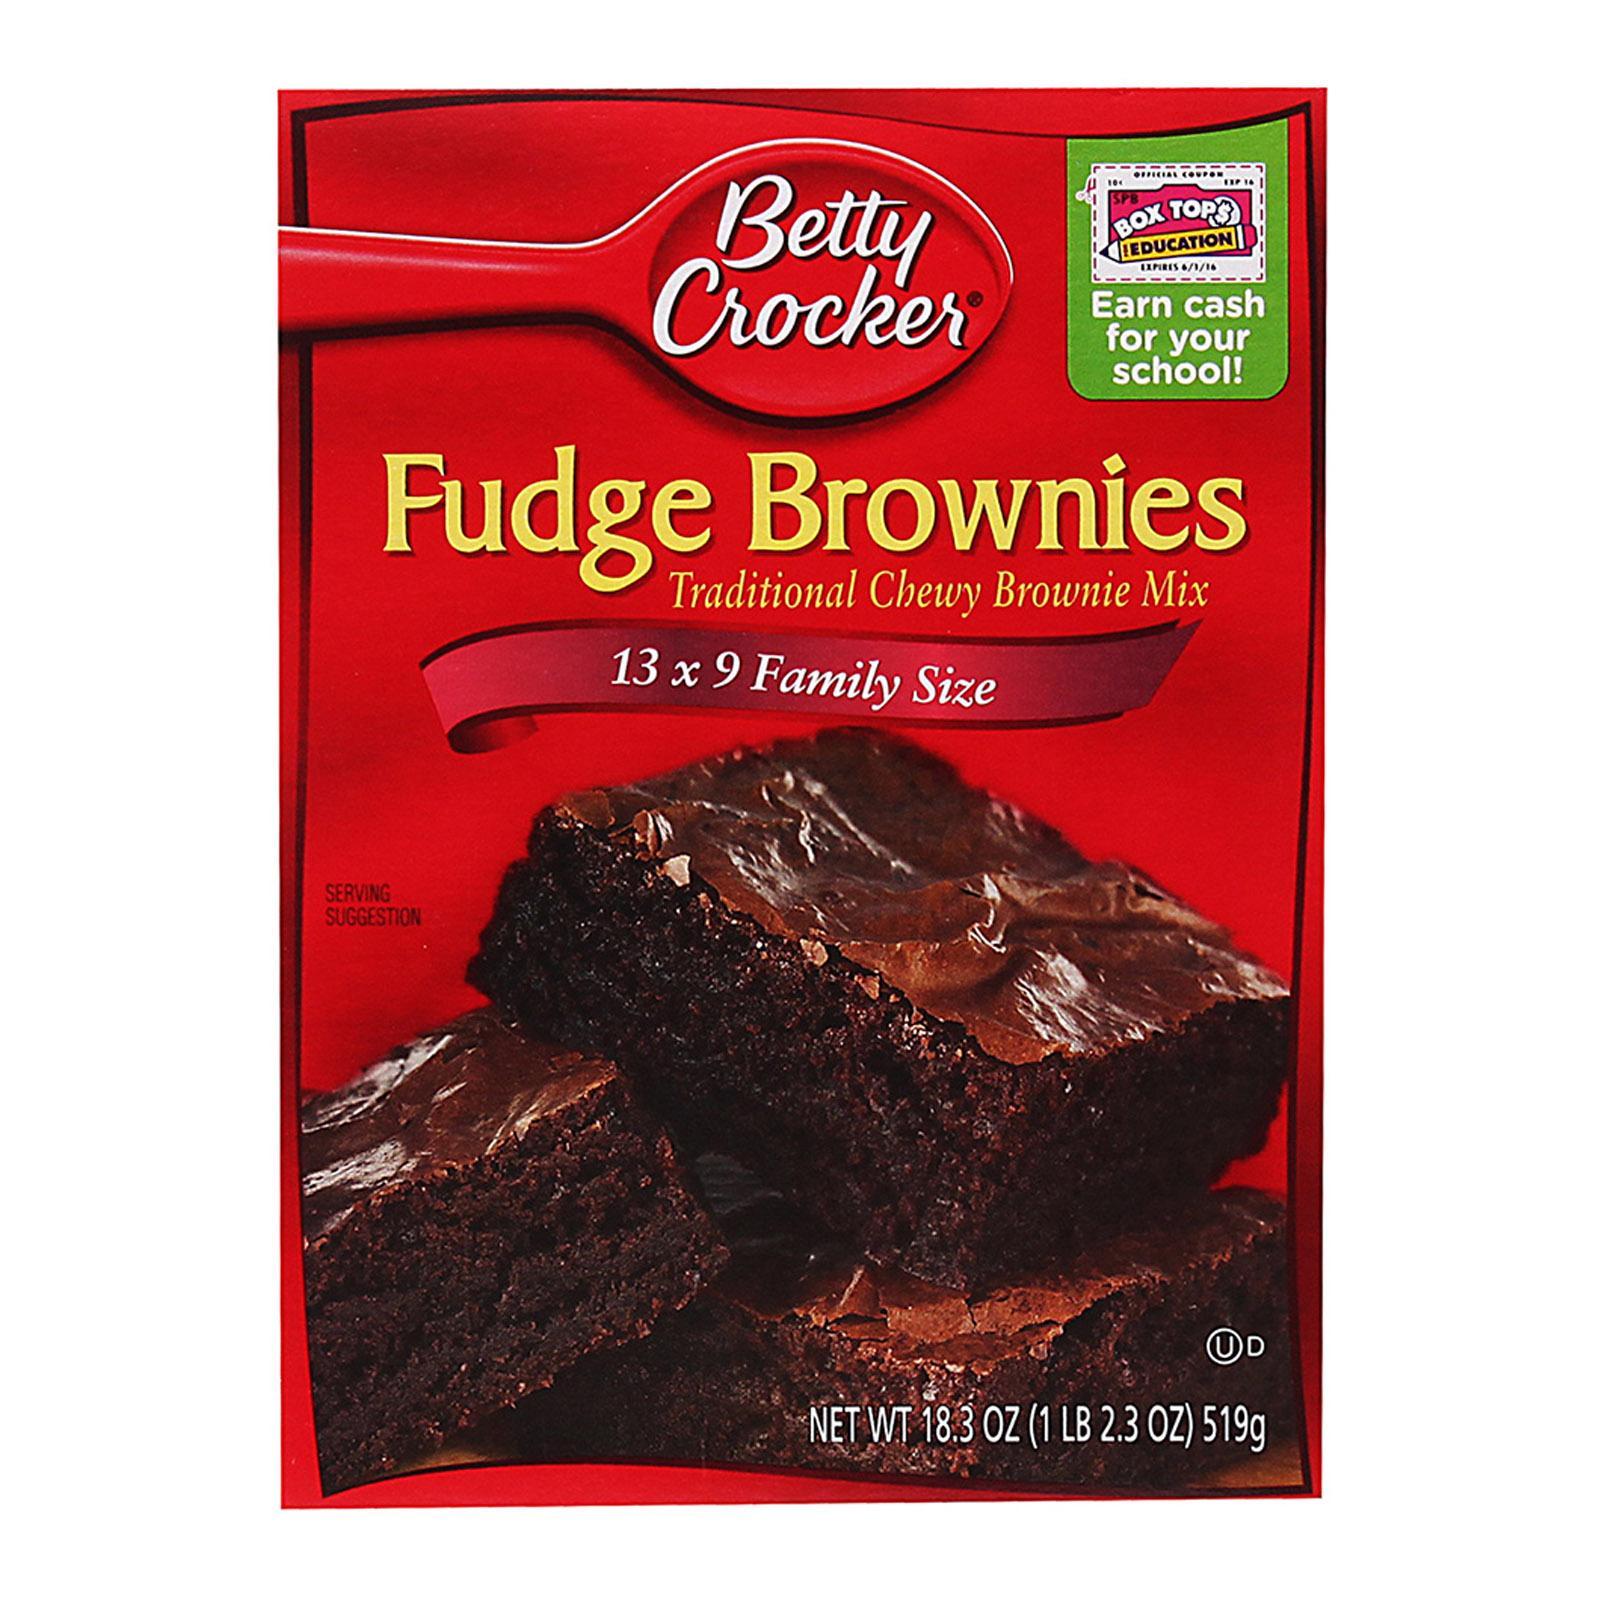 Betty Crocker Fudge Brownie Mix - Chocolate